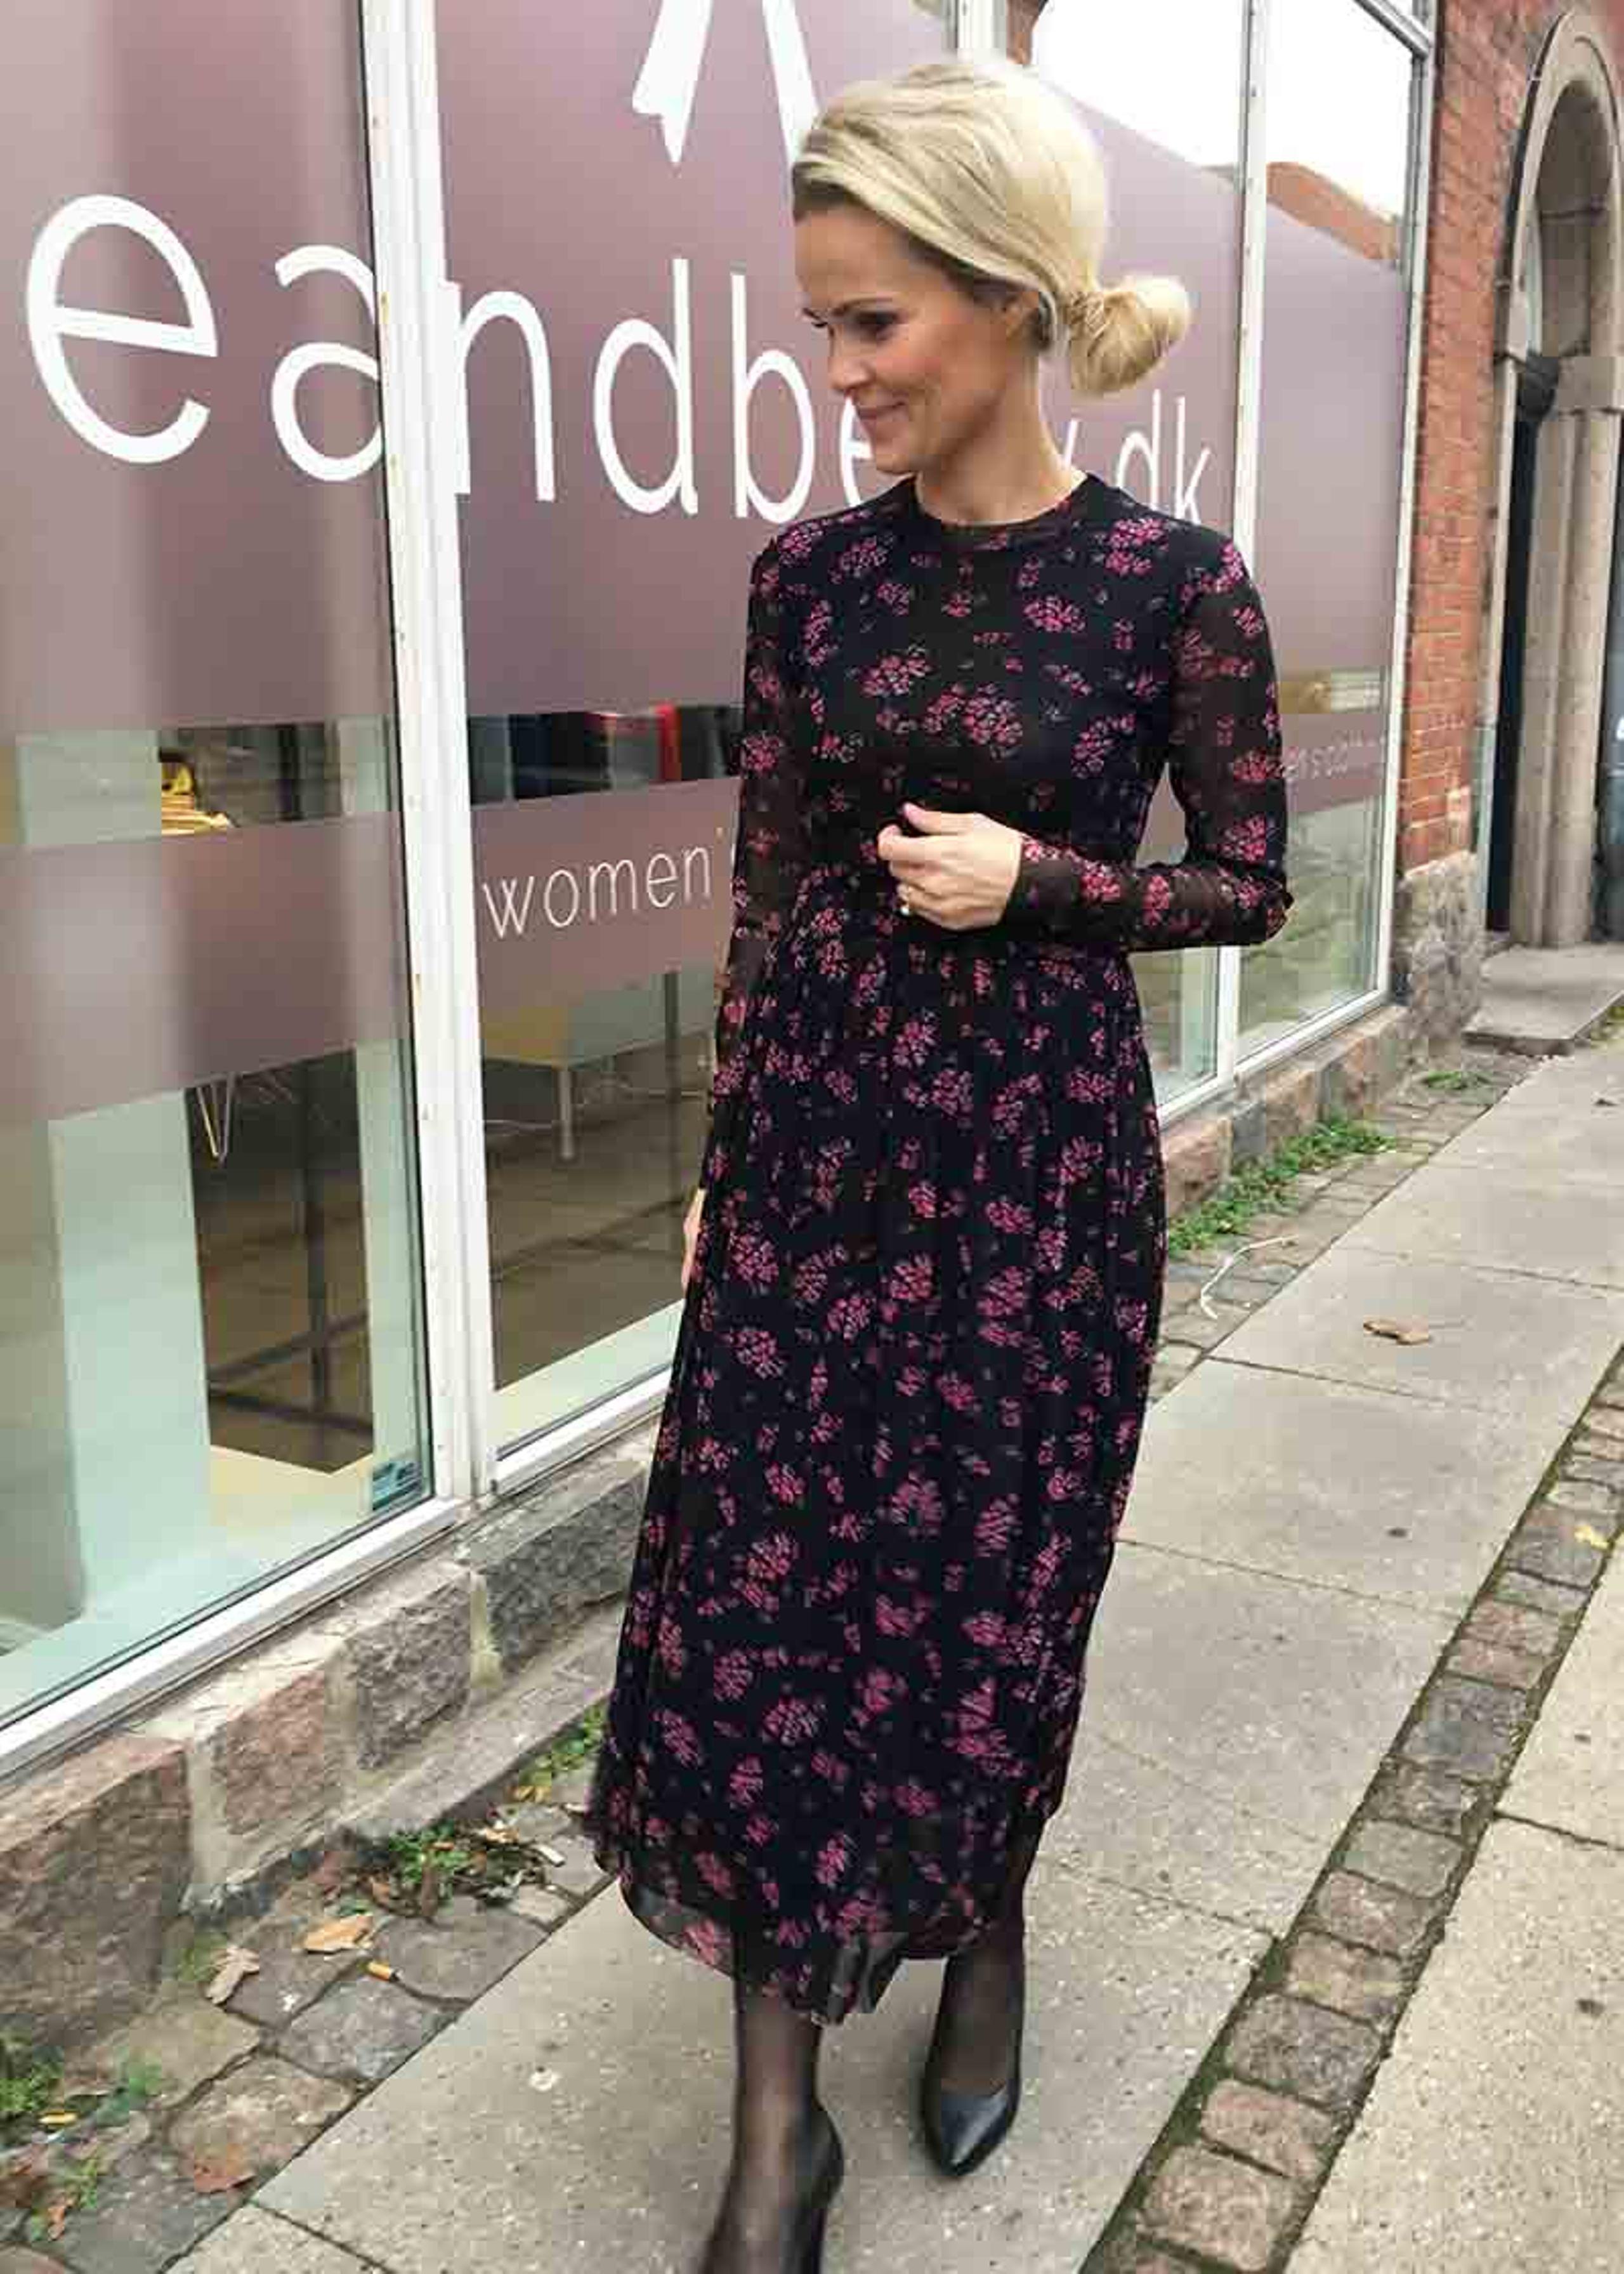 leticia printet dress